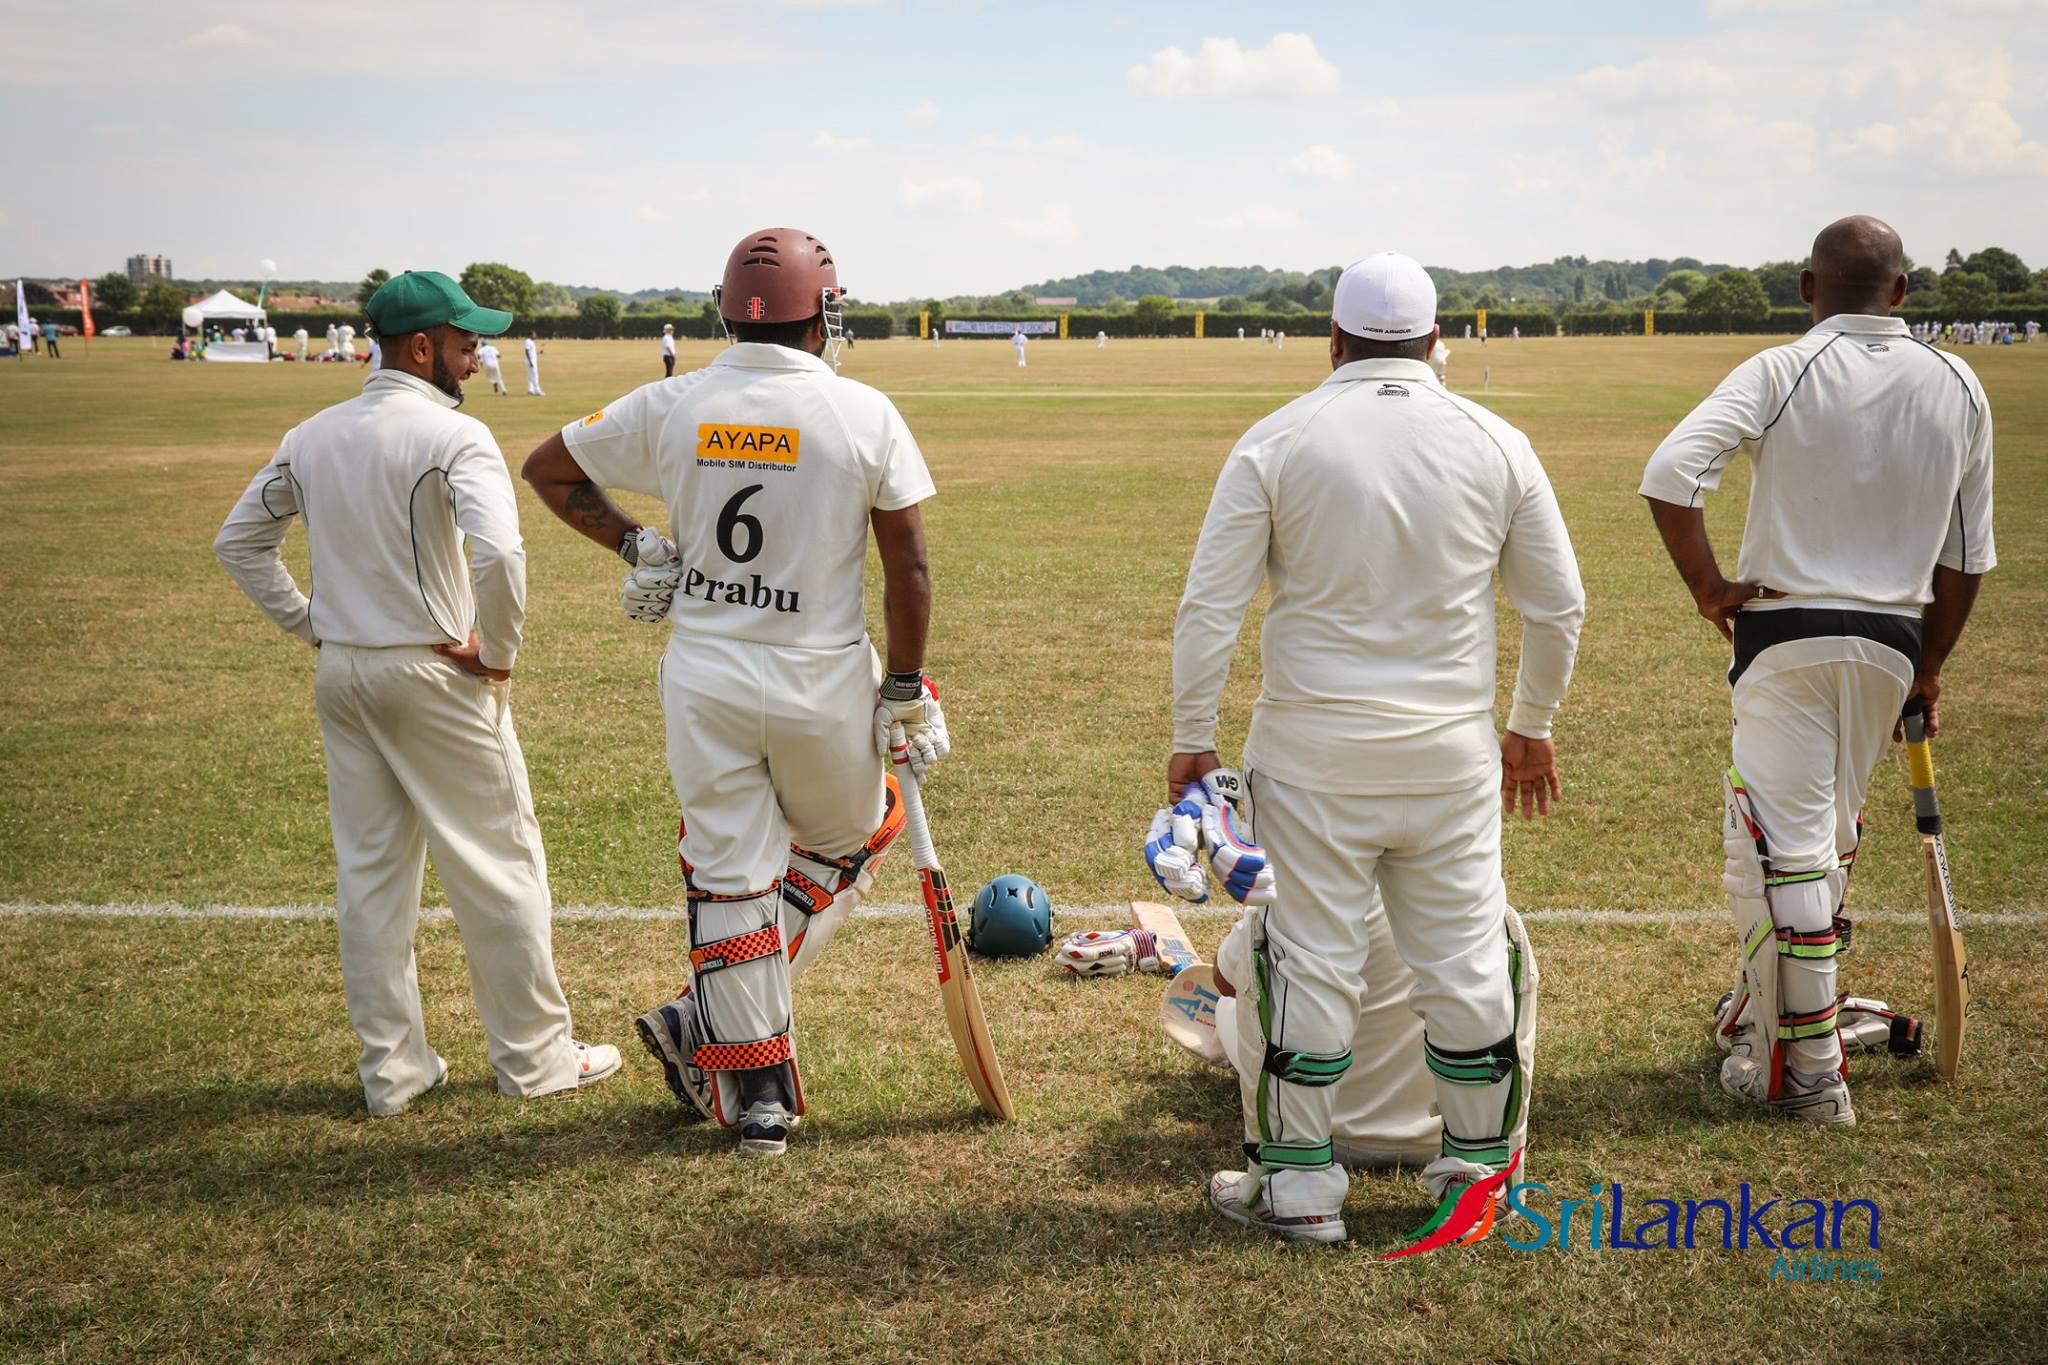 Sri-Lankan-airlines-cricket-festival-london-2017-natalia-smith--photography-29.jpg